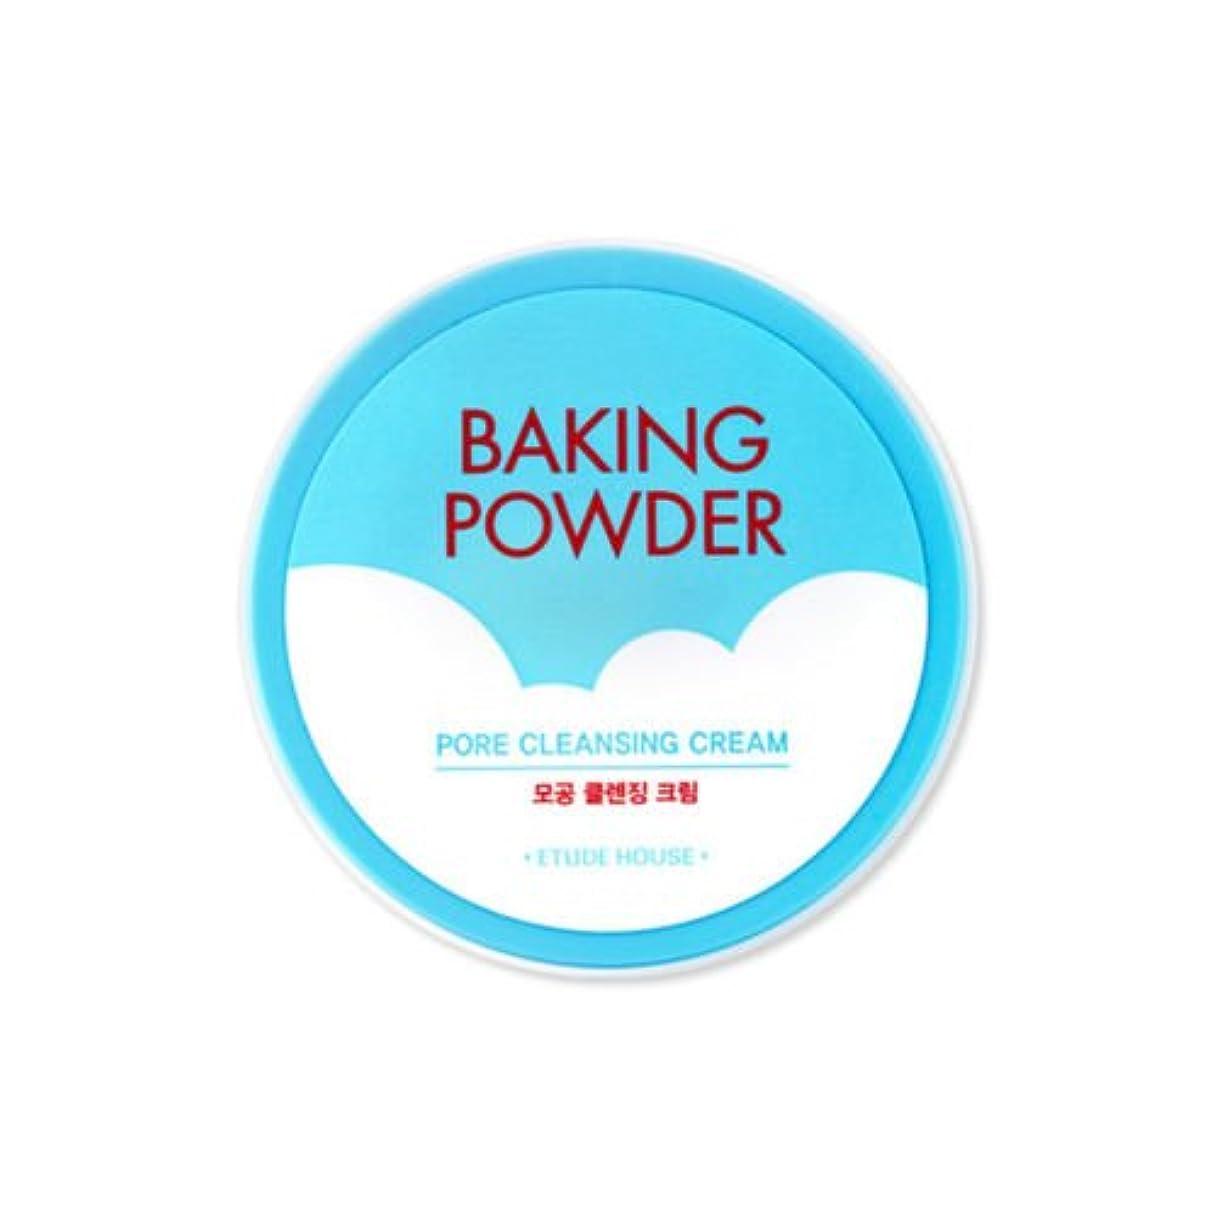 [2016 Upgrade!] ETUDE HOUSE Baking Powder Pore Cleansing Cream 180ml/エチュードハウス ベーキング パウダー ポア クレンジング クリーム 180ml